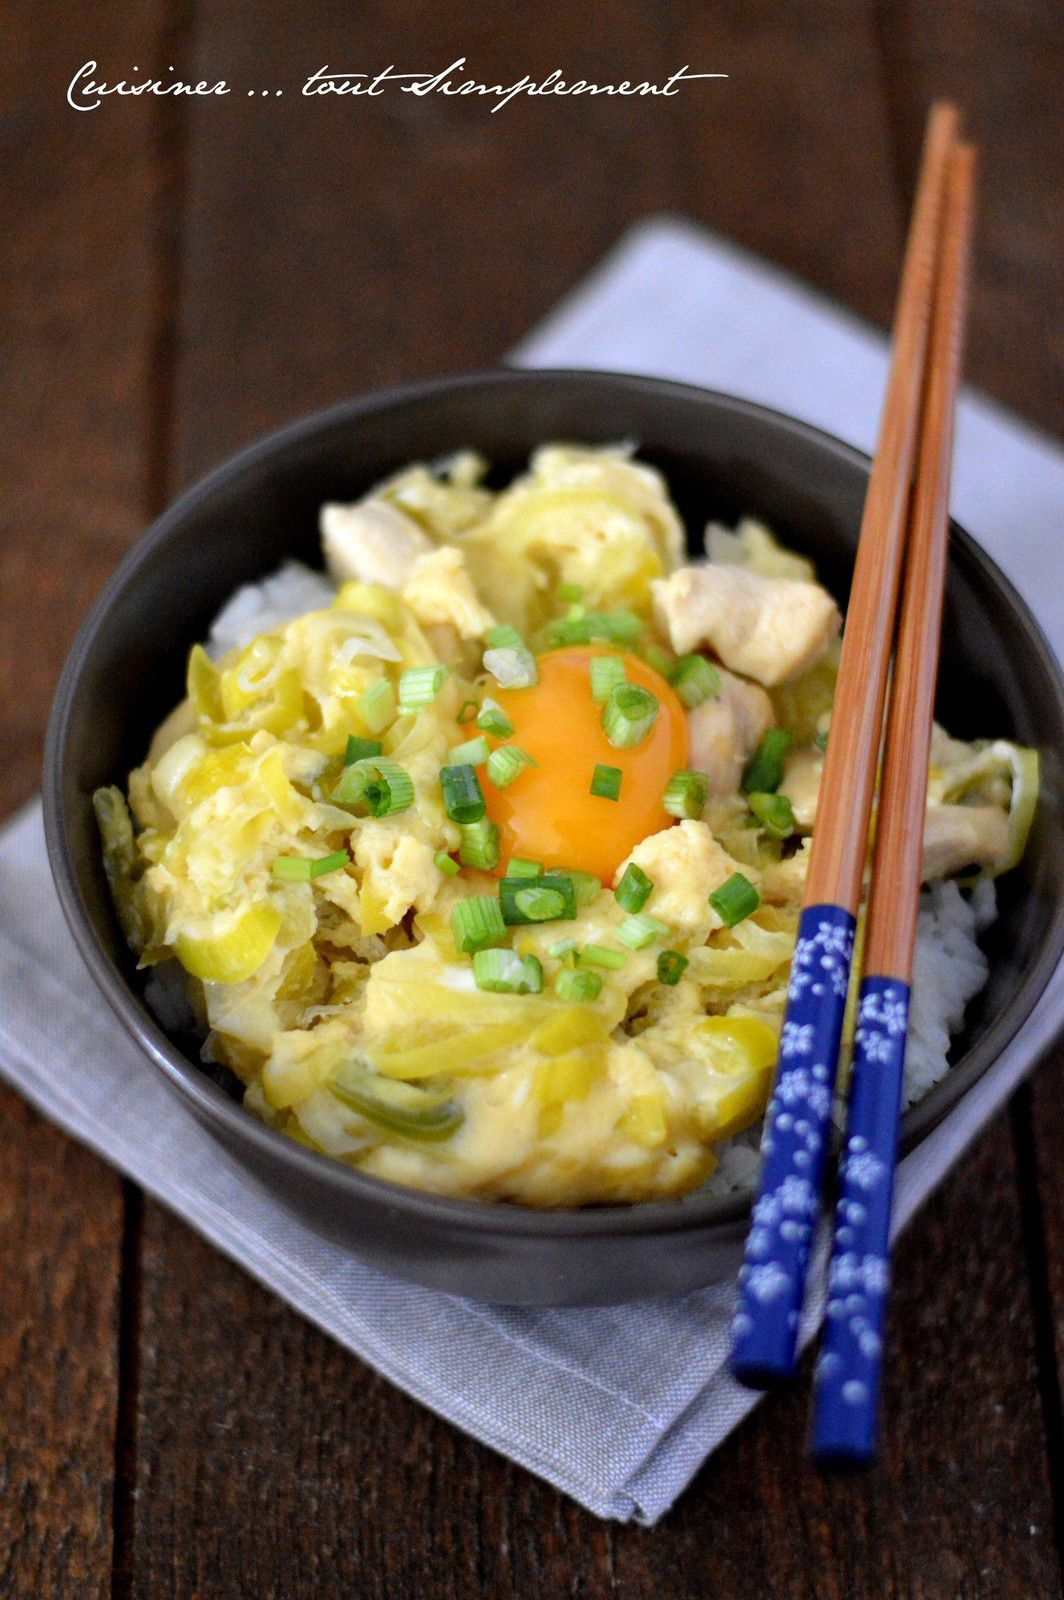 Cuisiner l'Oyako Donburi avec Junko